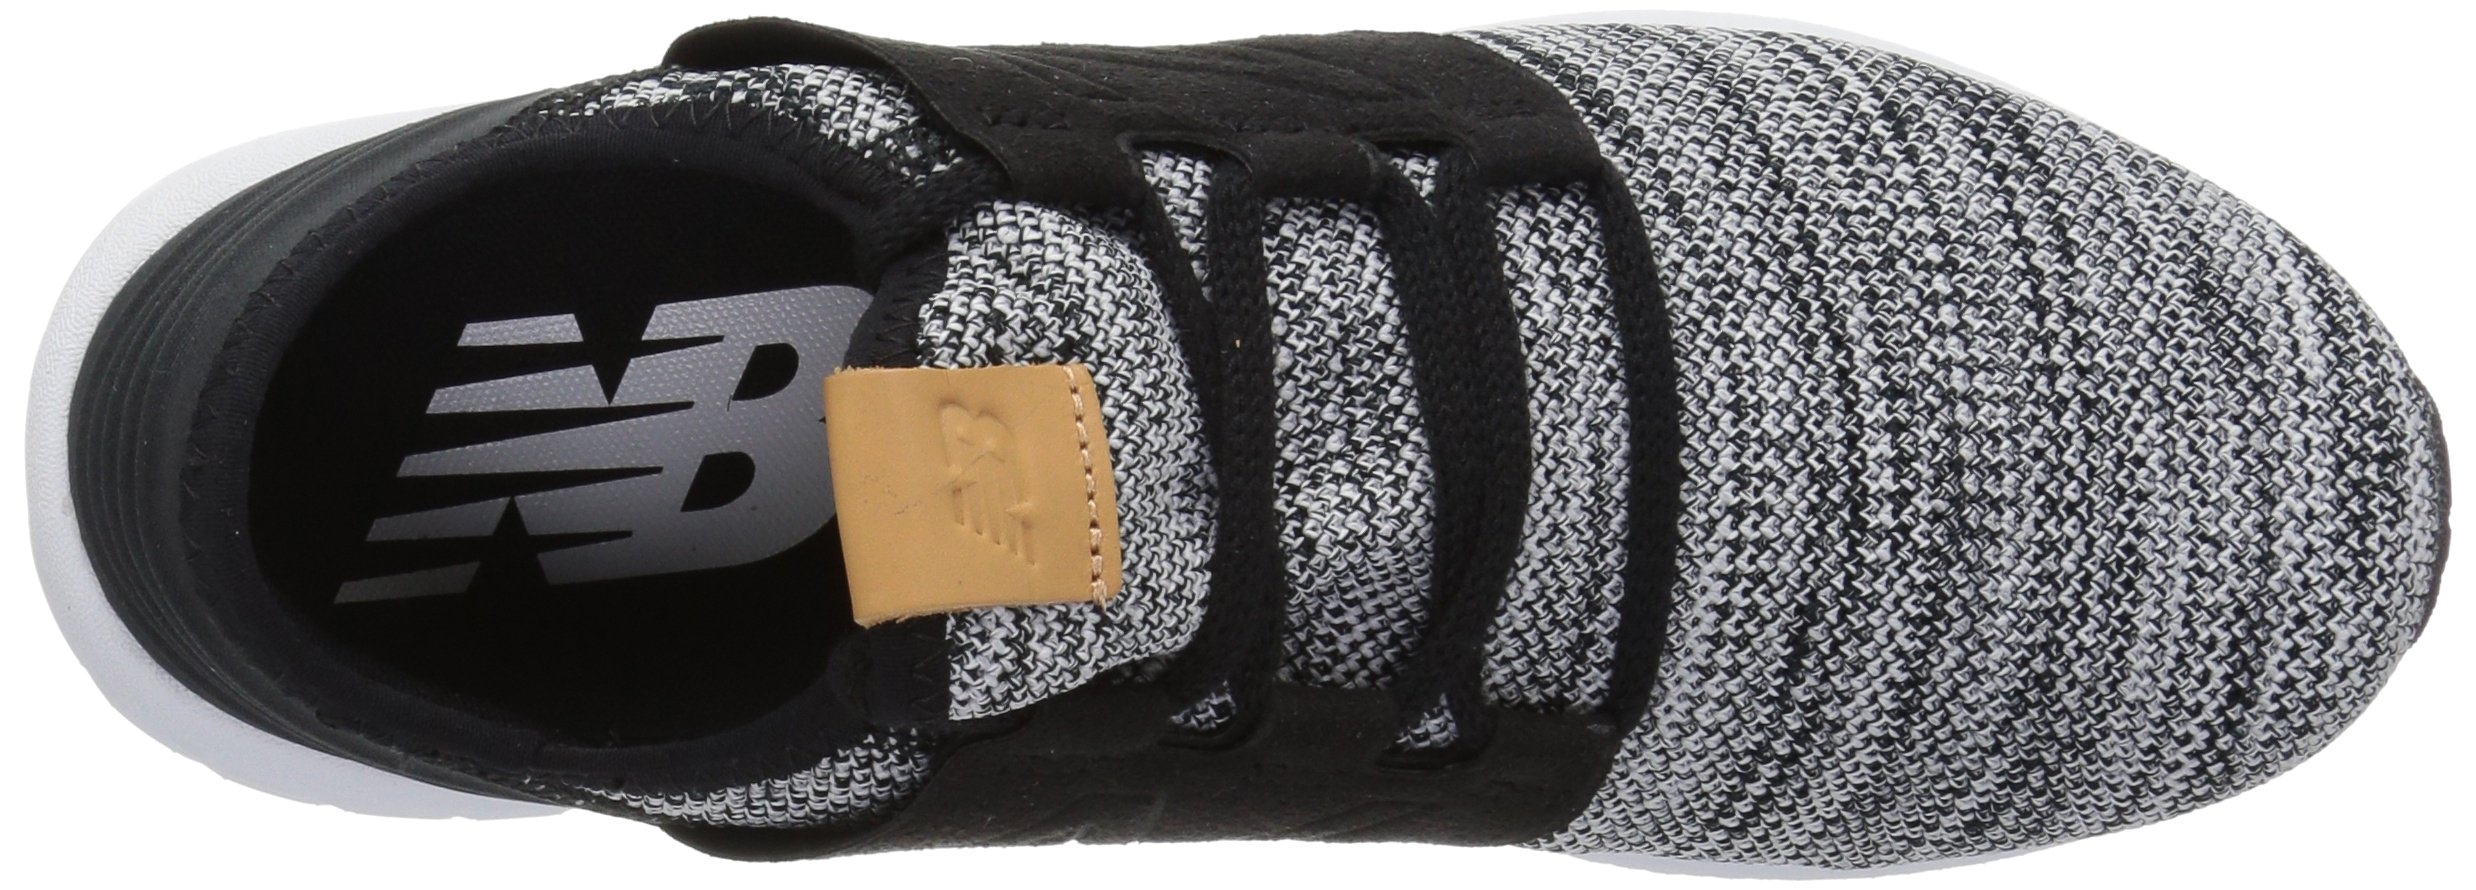 New Balance Men's Cruz V2 Fresh Foam Running Shoe, white/black, 7 D US by New Balance (Image #7)